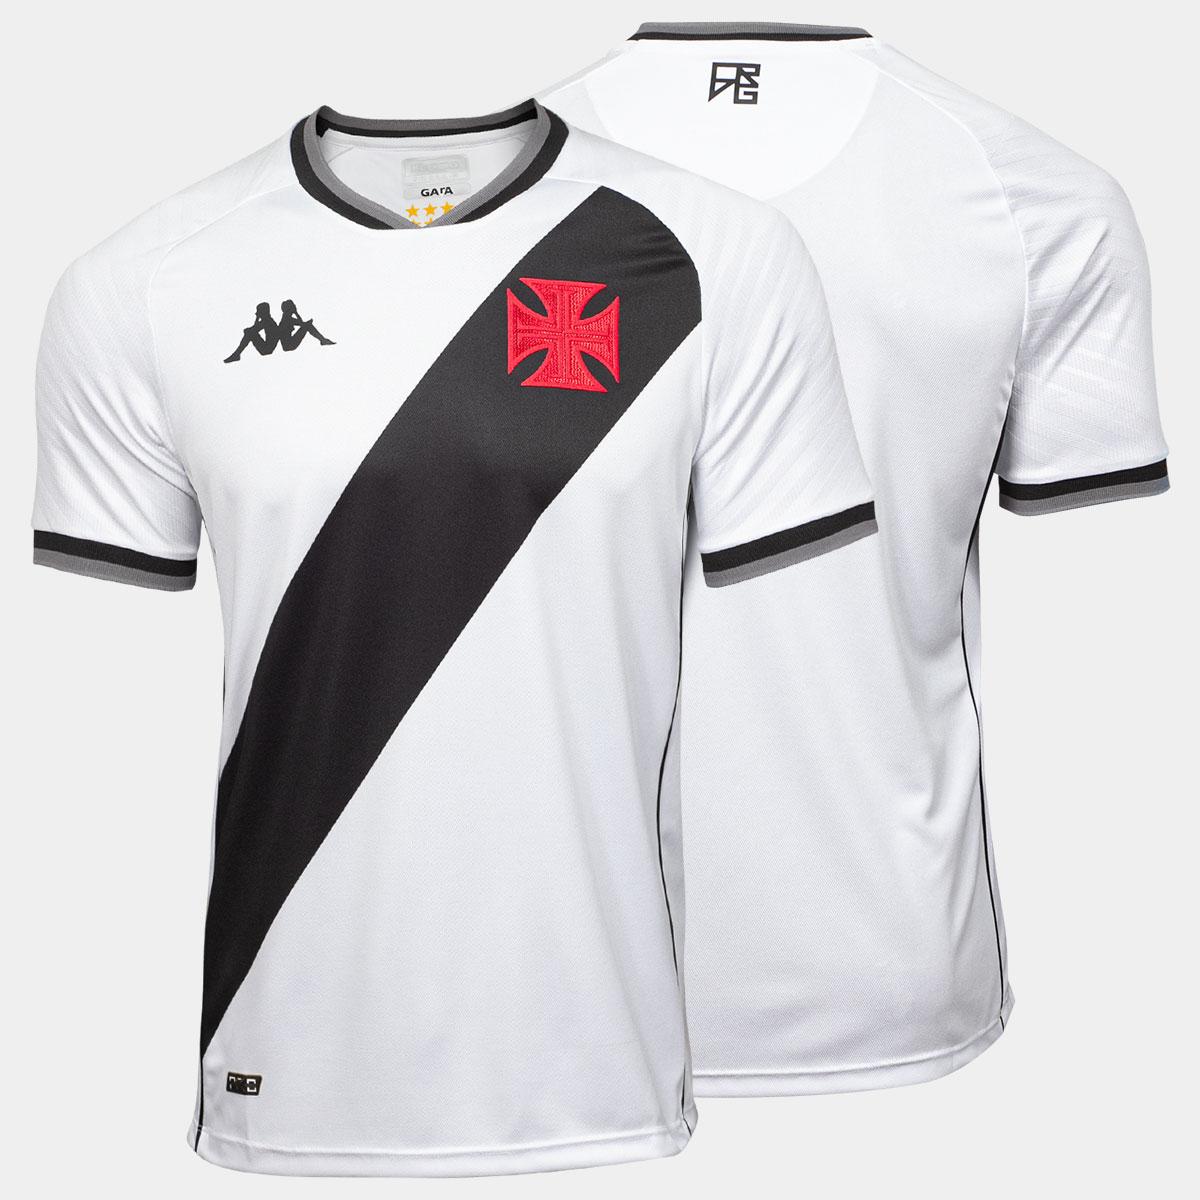 Camisa Vasco Jogo 2 Tamanho Especial - Kappa 2021